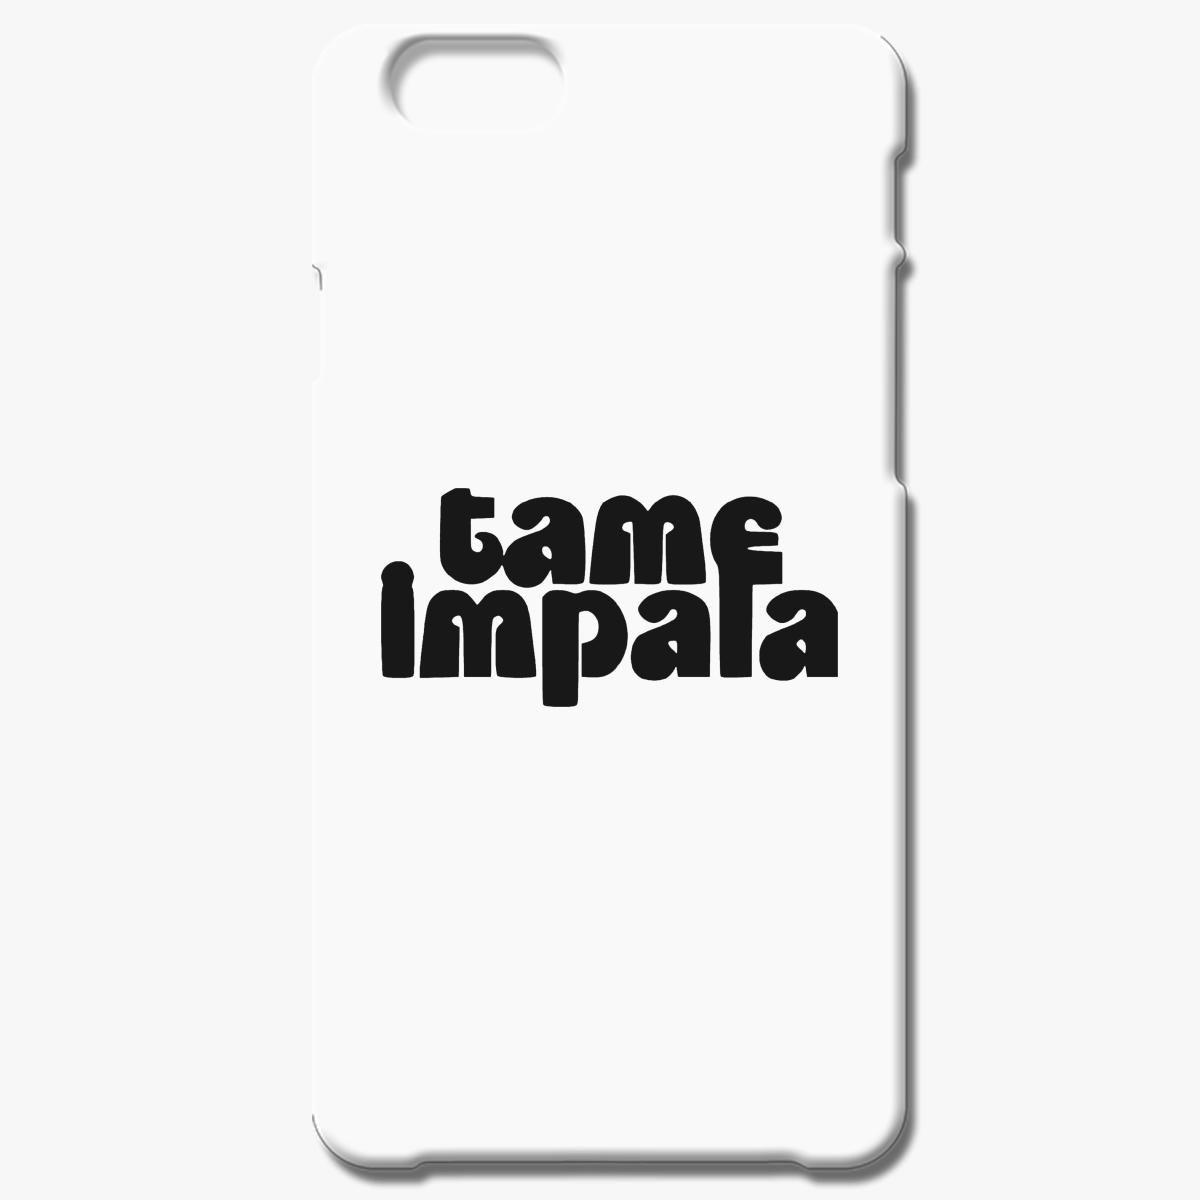 Tame Impala Band Logo Iphone 6 6s Case